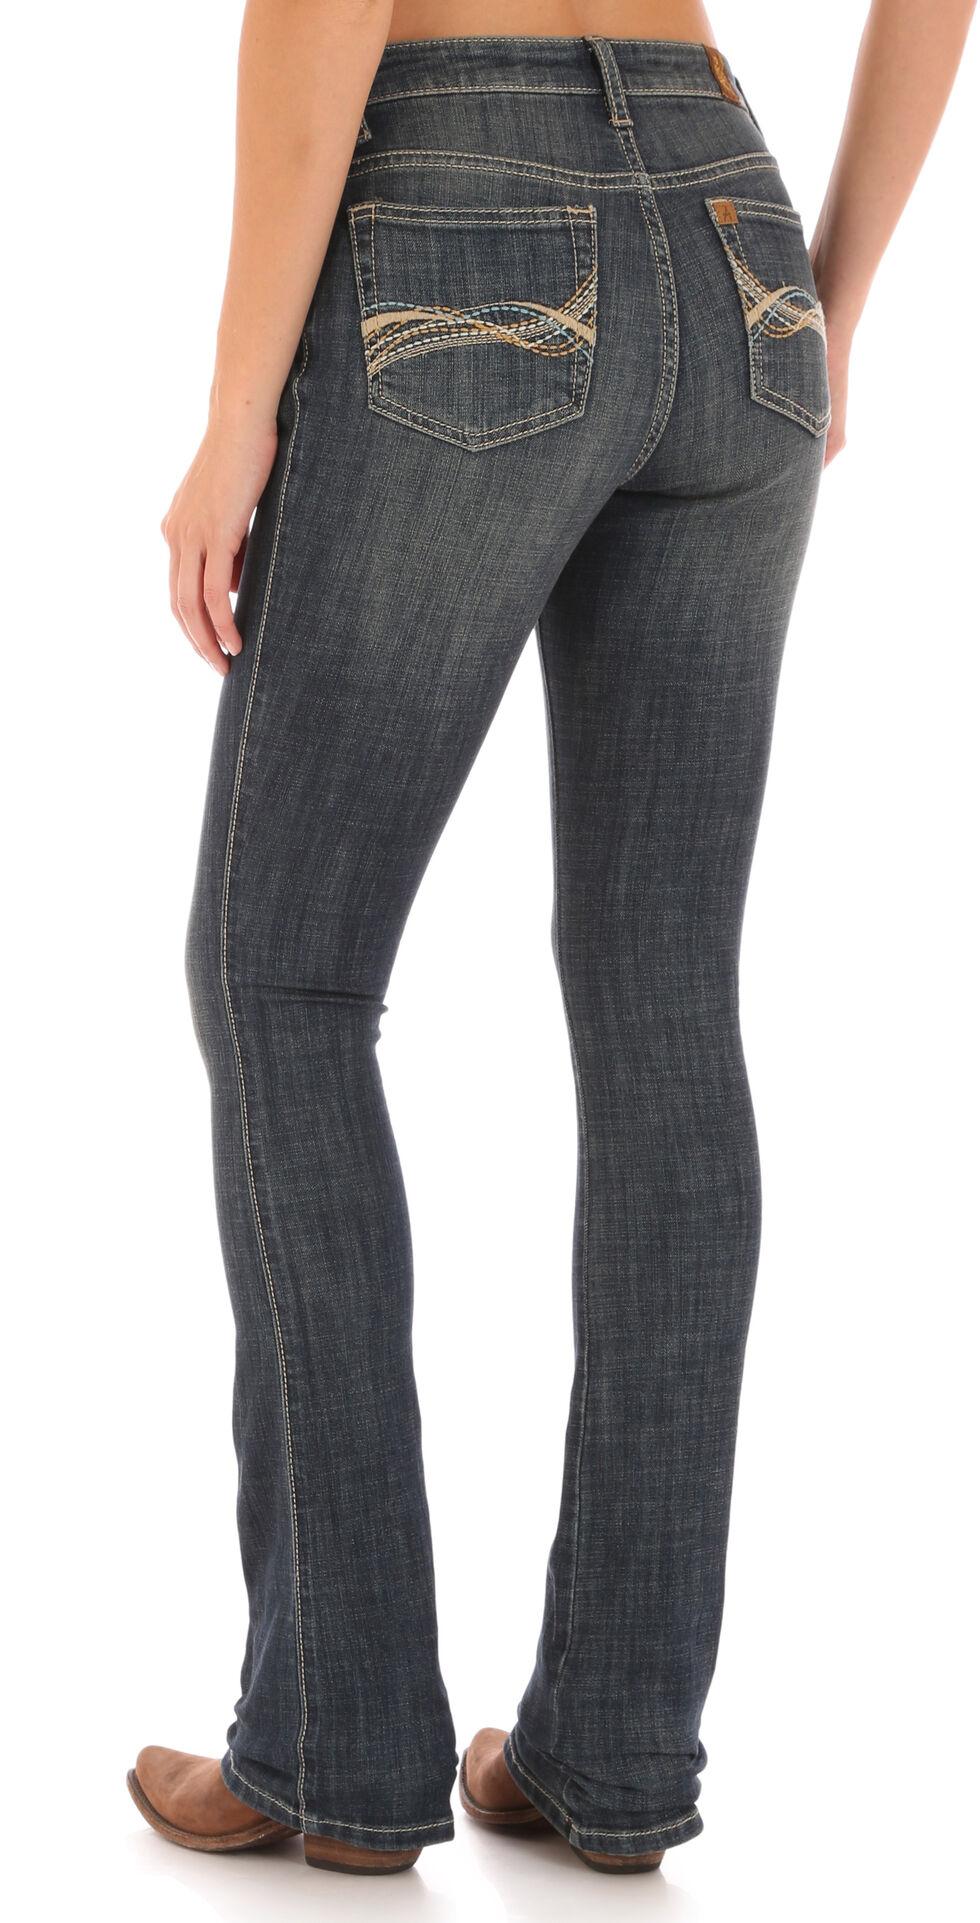 Wrangler Women's Aura Instantly Jeans, Indigo, hi-res